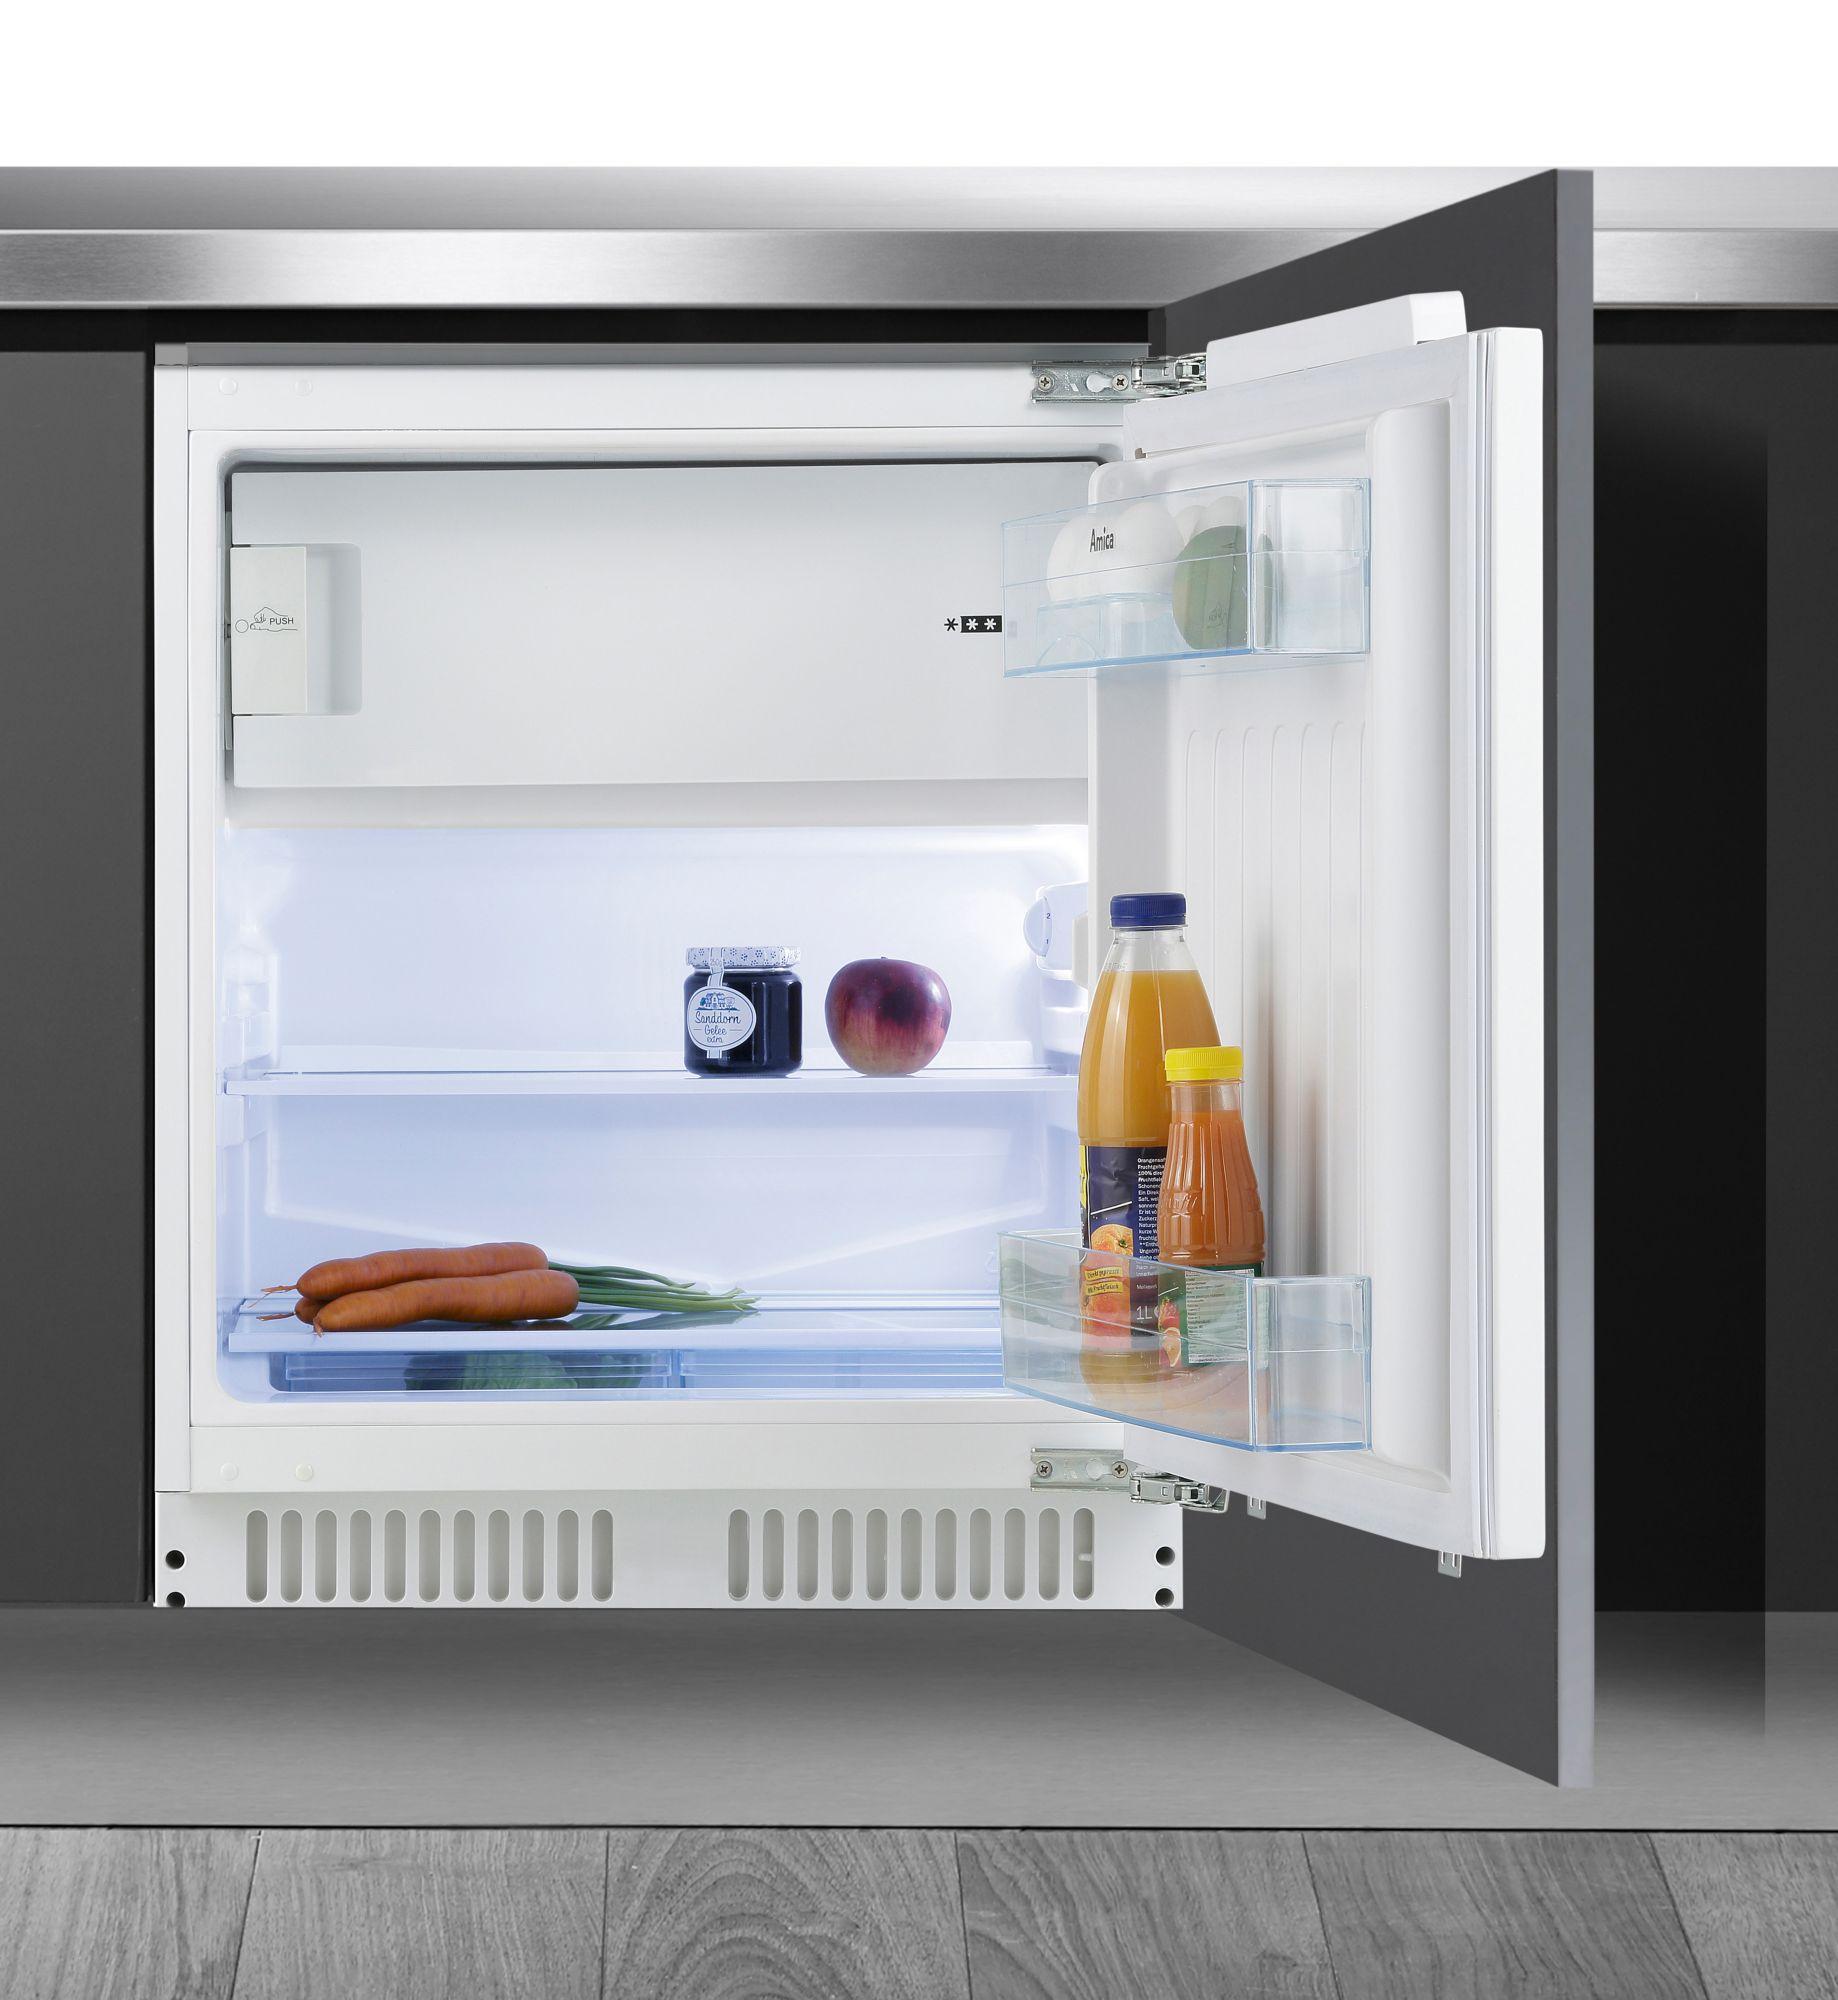 AMICA Amica Einbaukühlschrank UKS 16158, A++, Höhe max. 87 cm